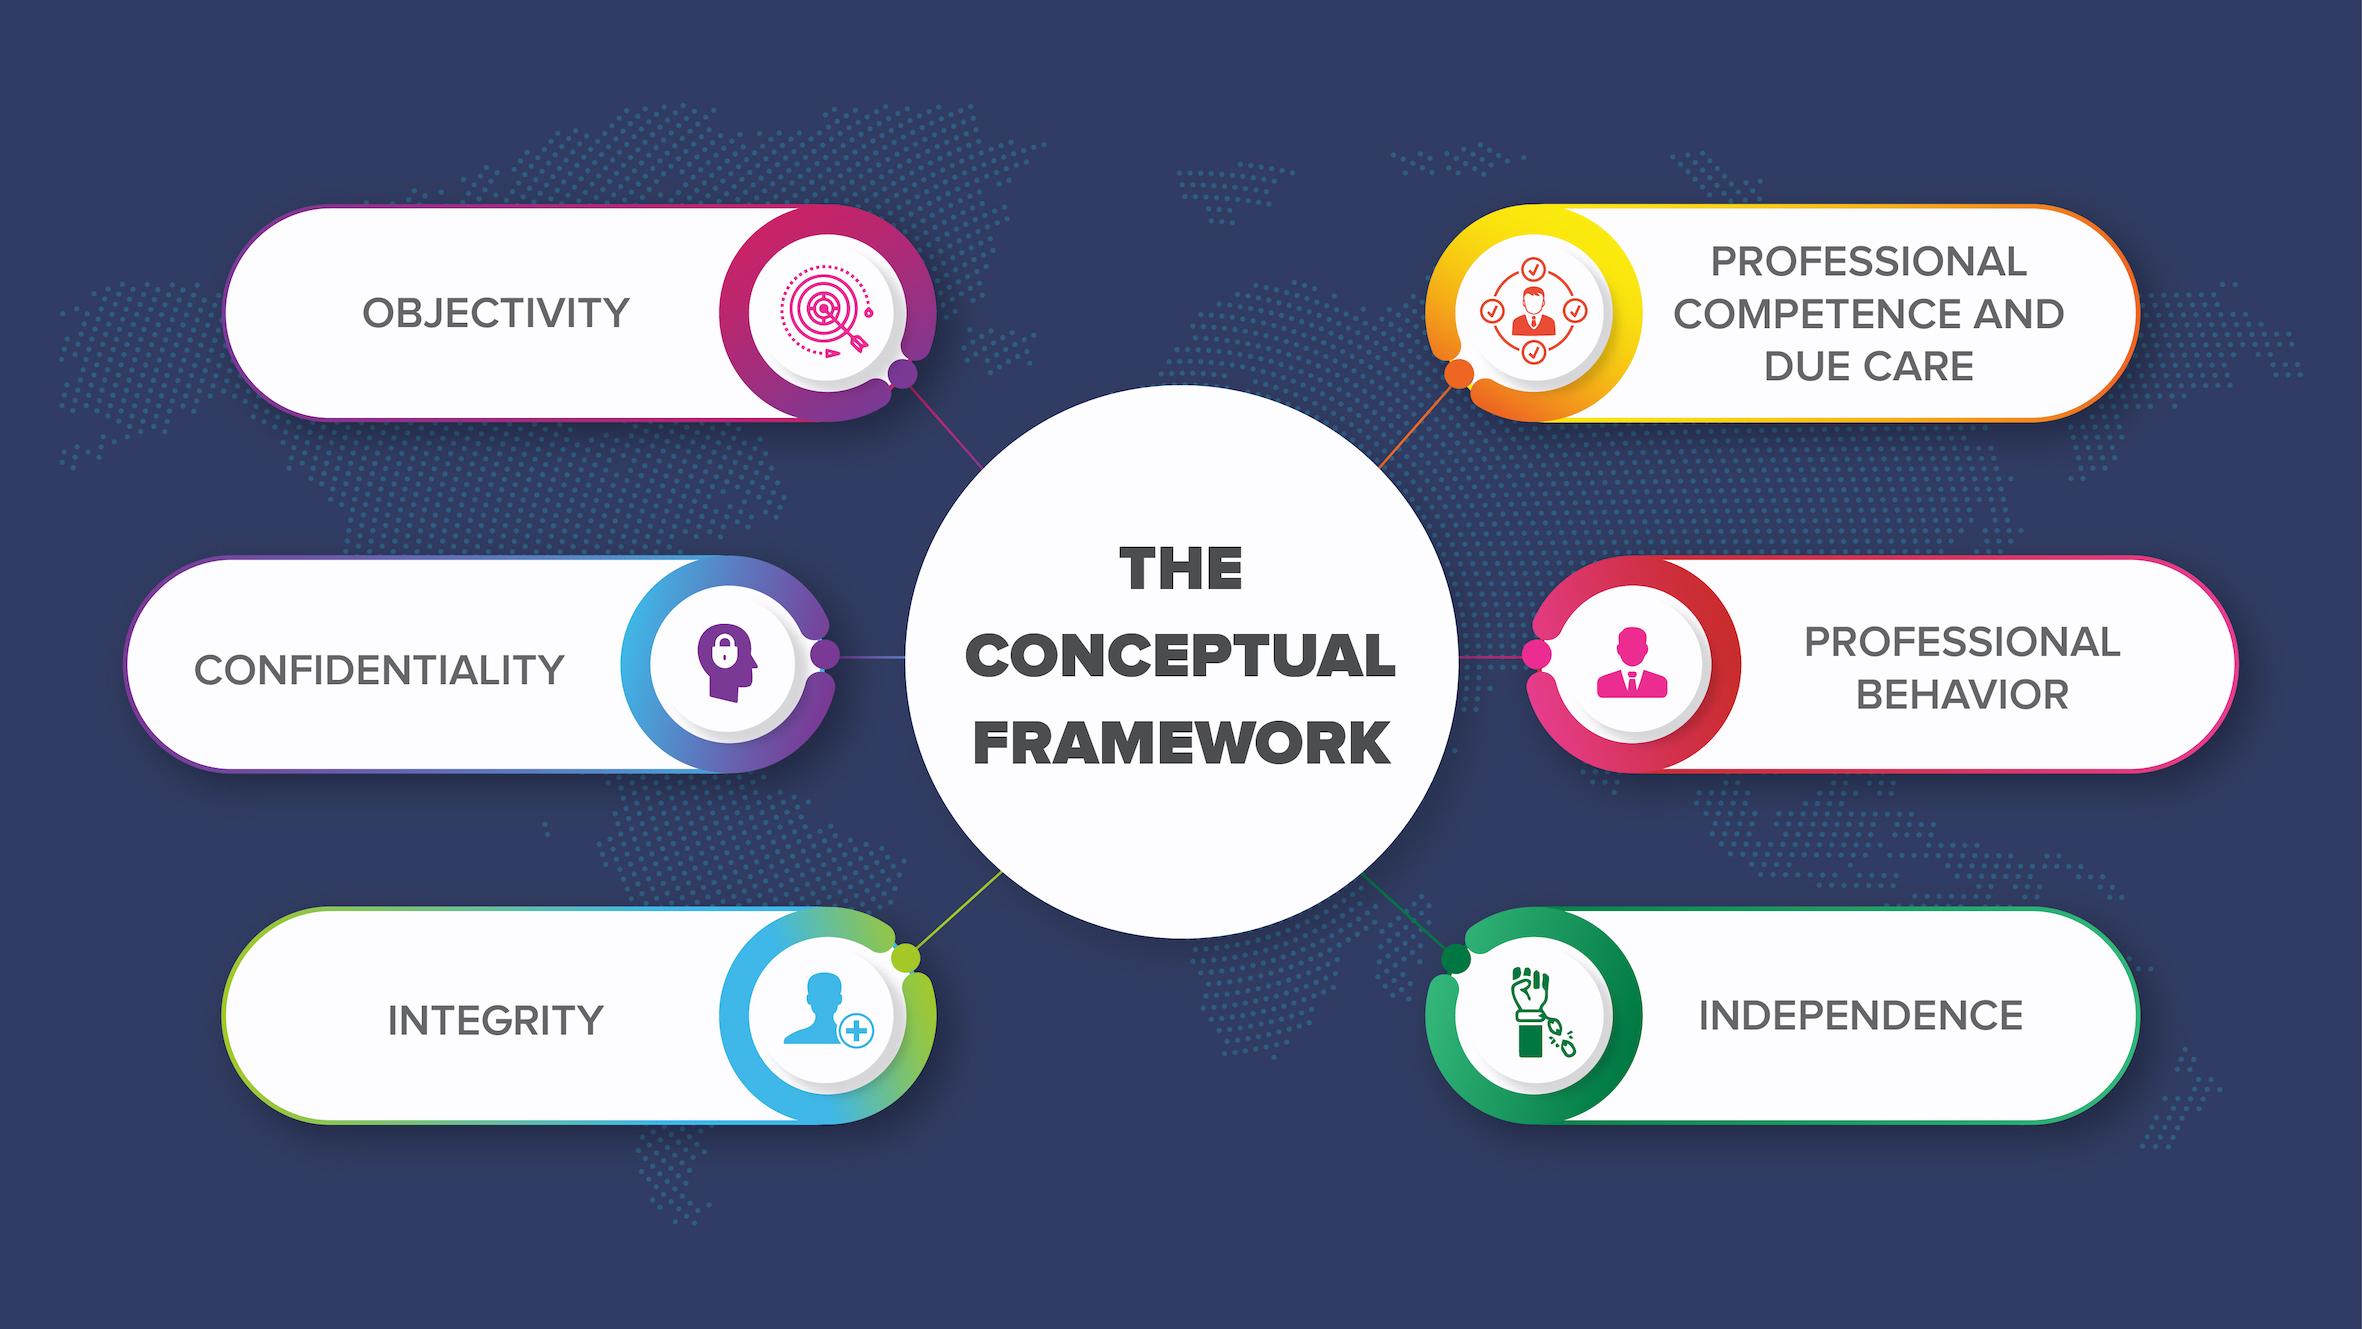 Conceptual Framework of Ethics